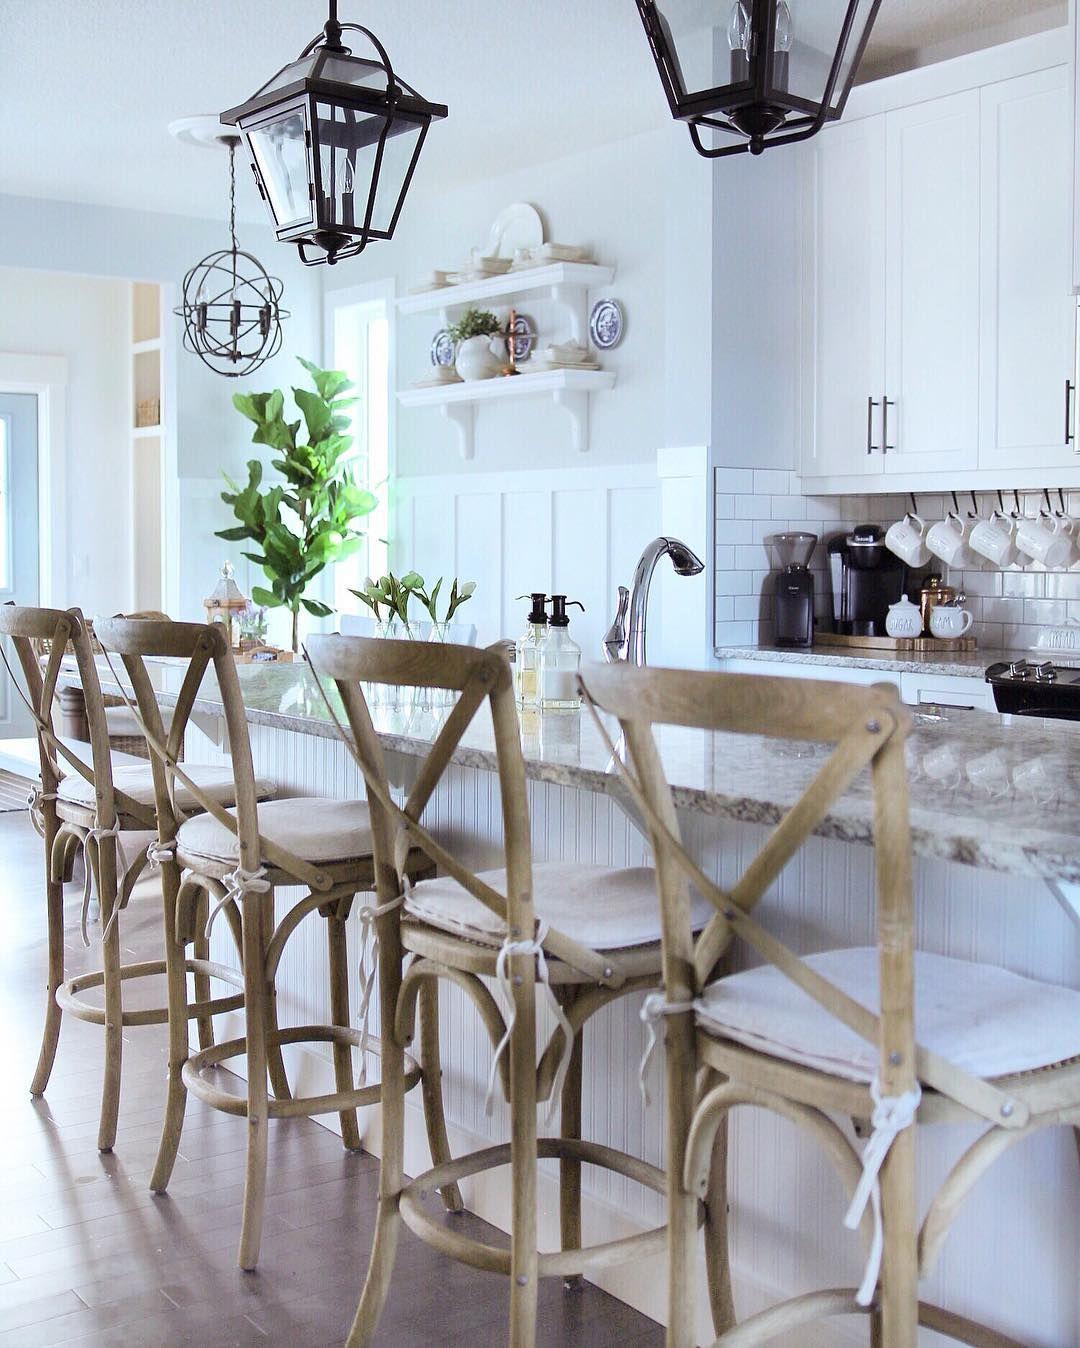 Restoration hardware barstools, white kitchen, board and ...